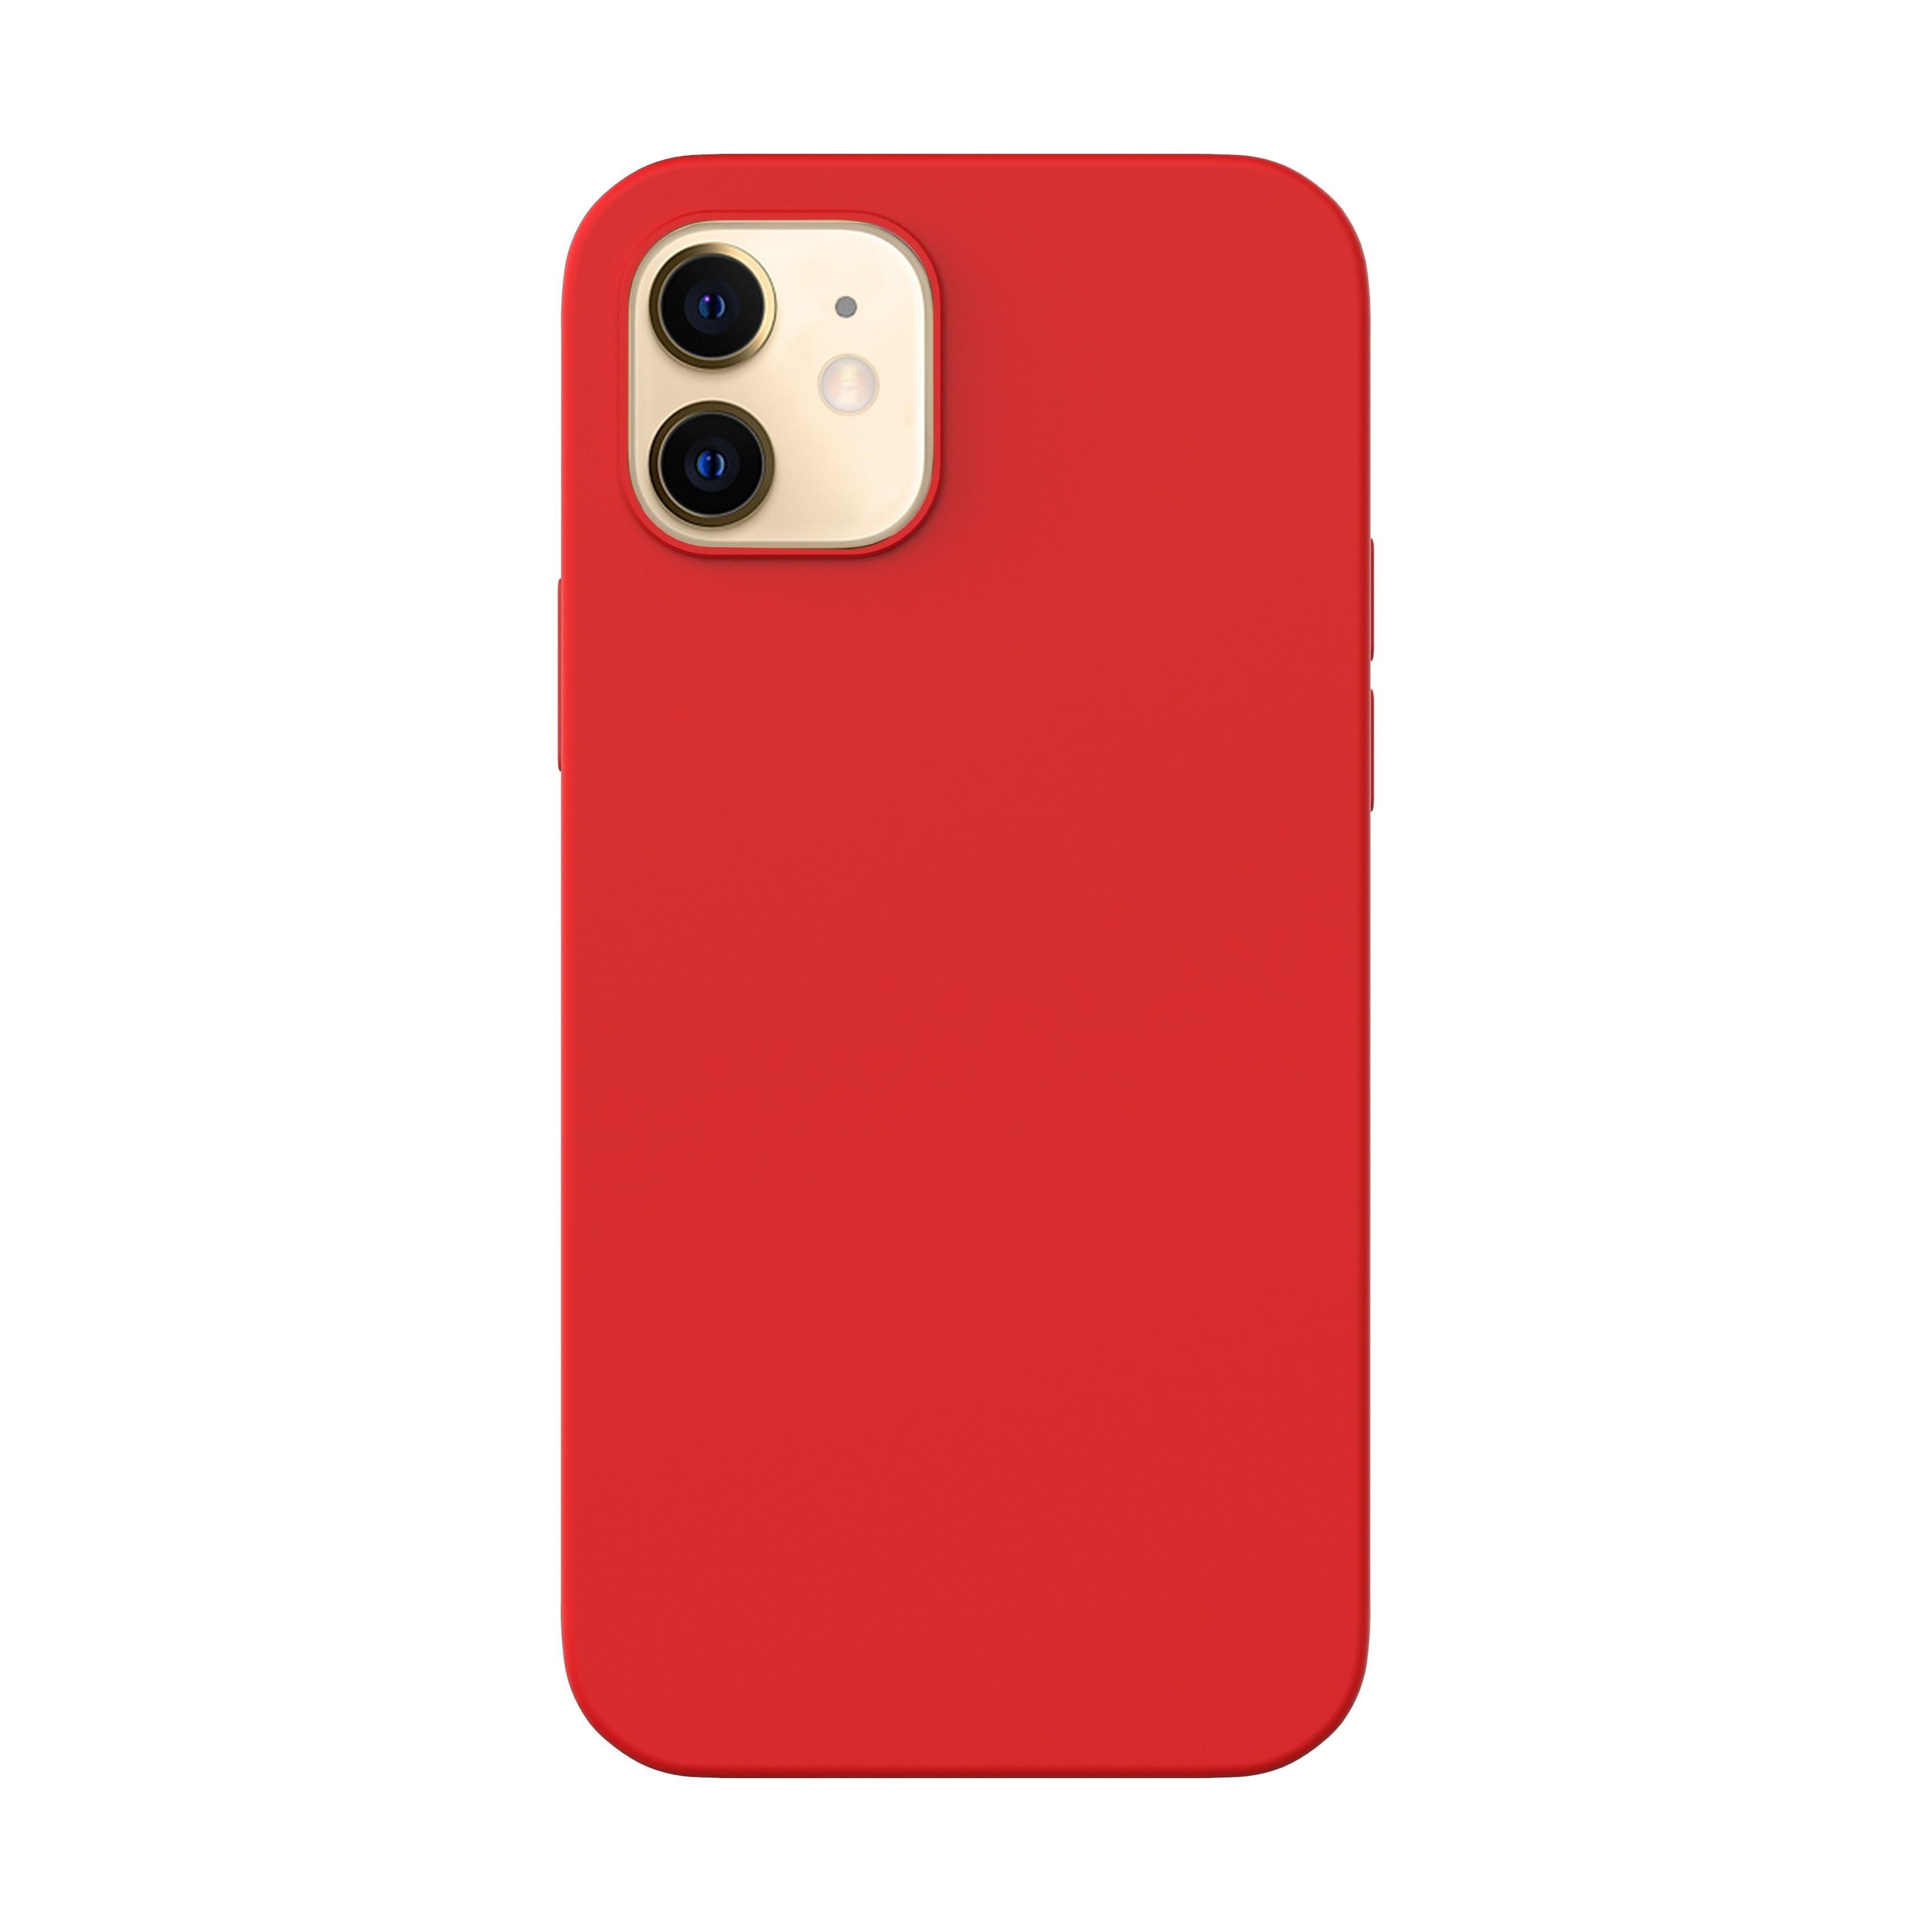 Capac protectie spate cellara din silicon colectia slim pentru iphone 12 mini - rosu